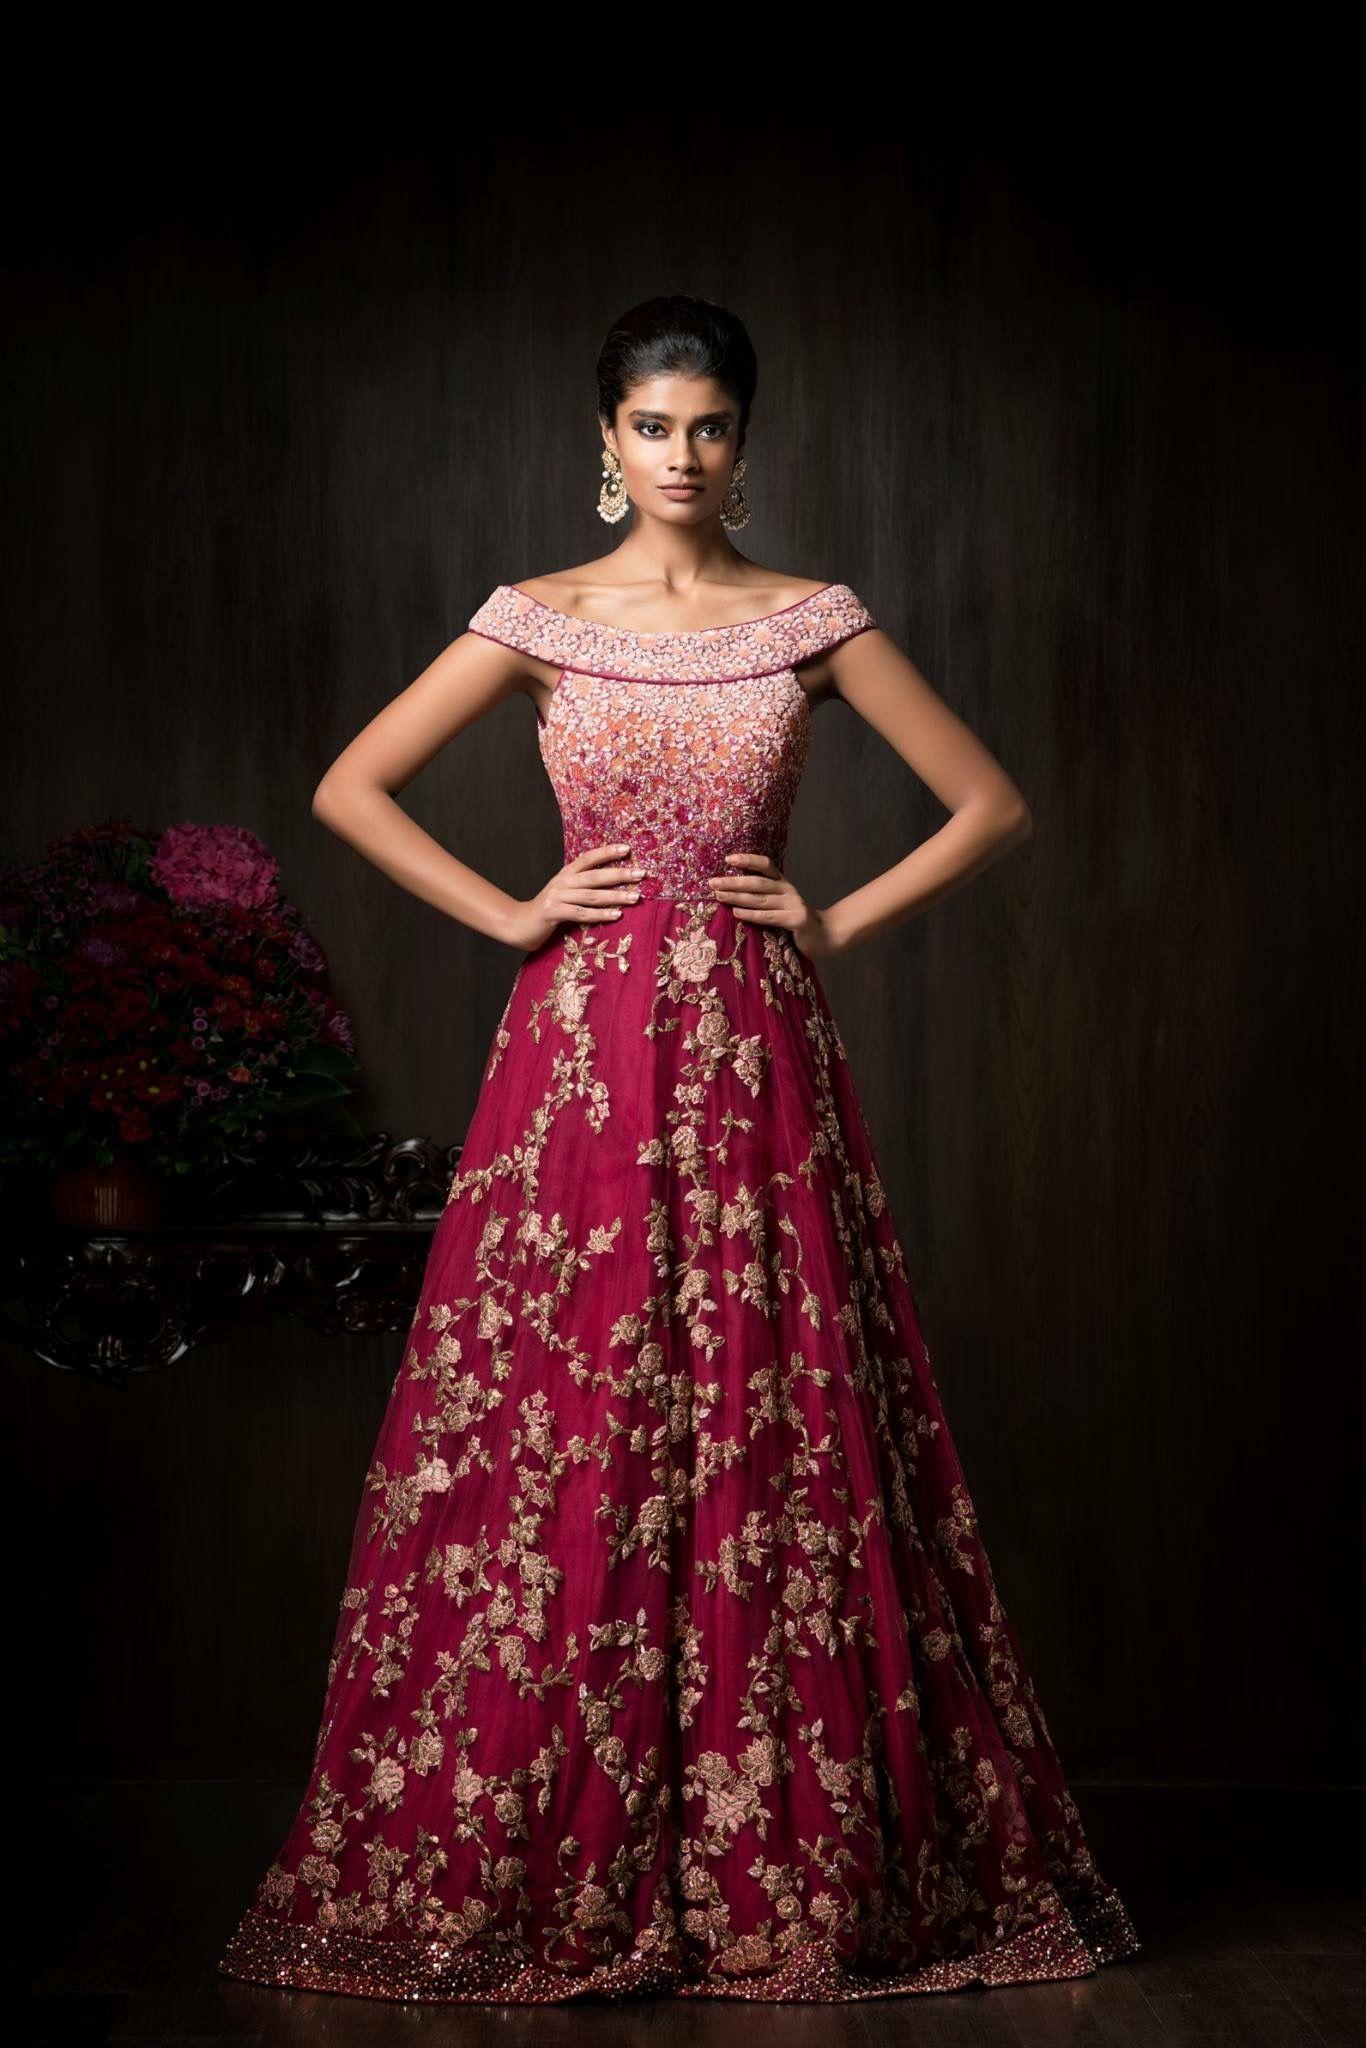 fd66bd6666 #eid #dresses #desi #style #wedding #party #wear #woman's #fashion #asian  #attires #indian #bangladeshi #pakistani #clothing